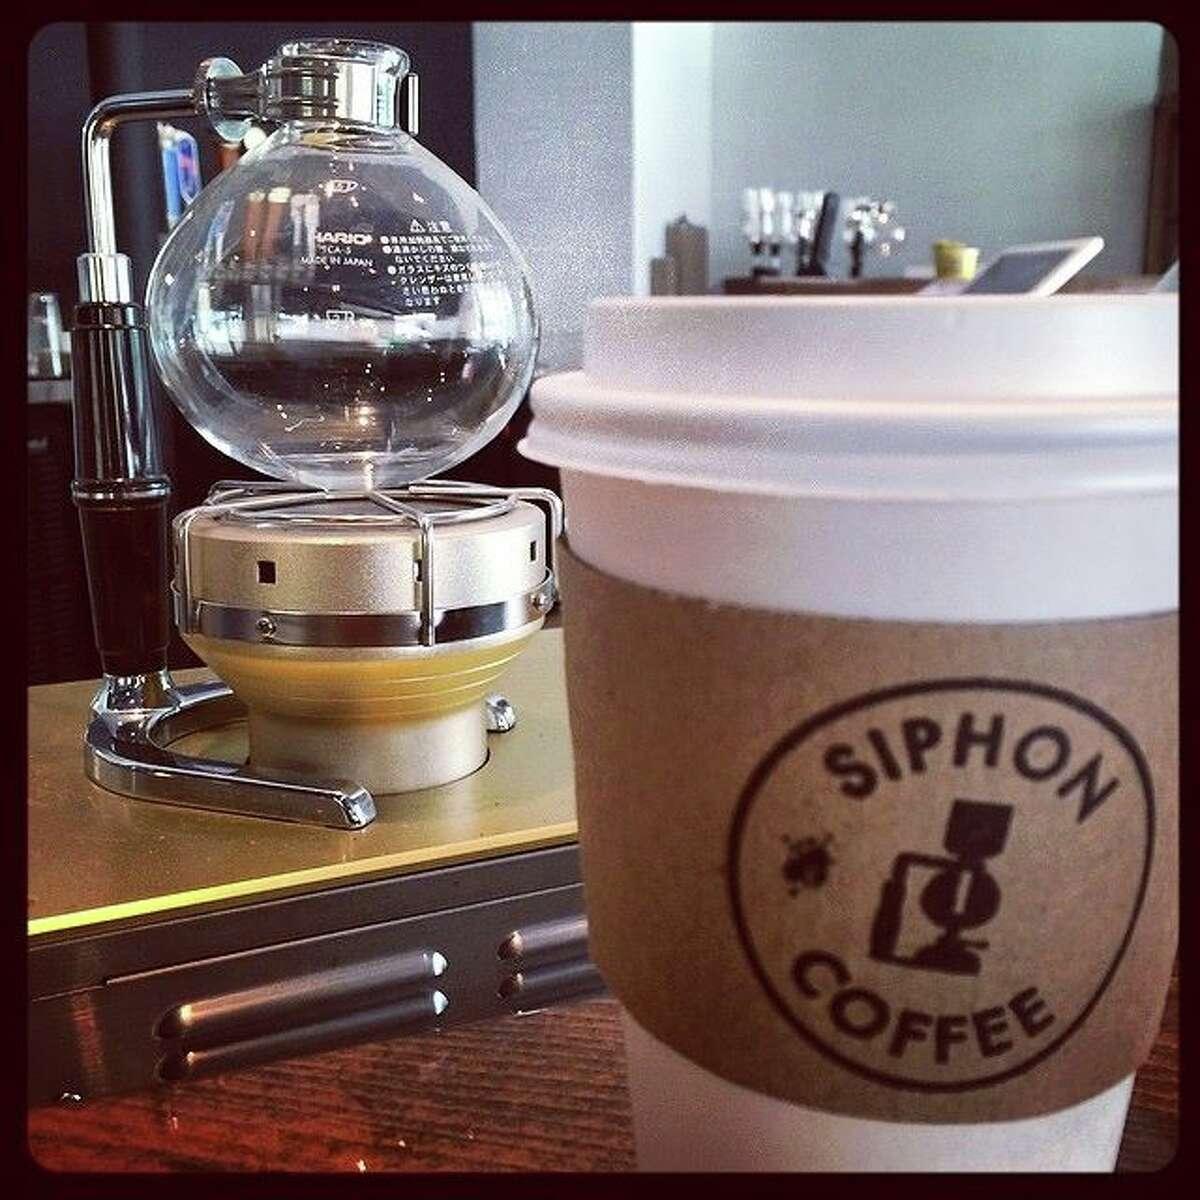 Siphon Coffee Address: 701 W Alabama Phone: (281) 974-4426 Hours:7 a.m.-10 p.m. Website: facebook.com/siphoncoffeehouston